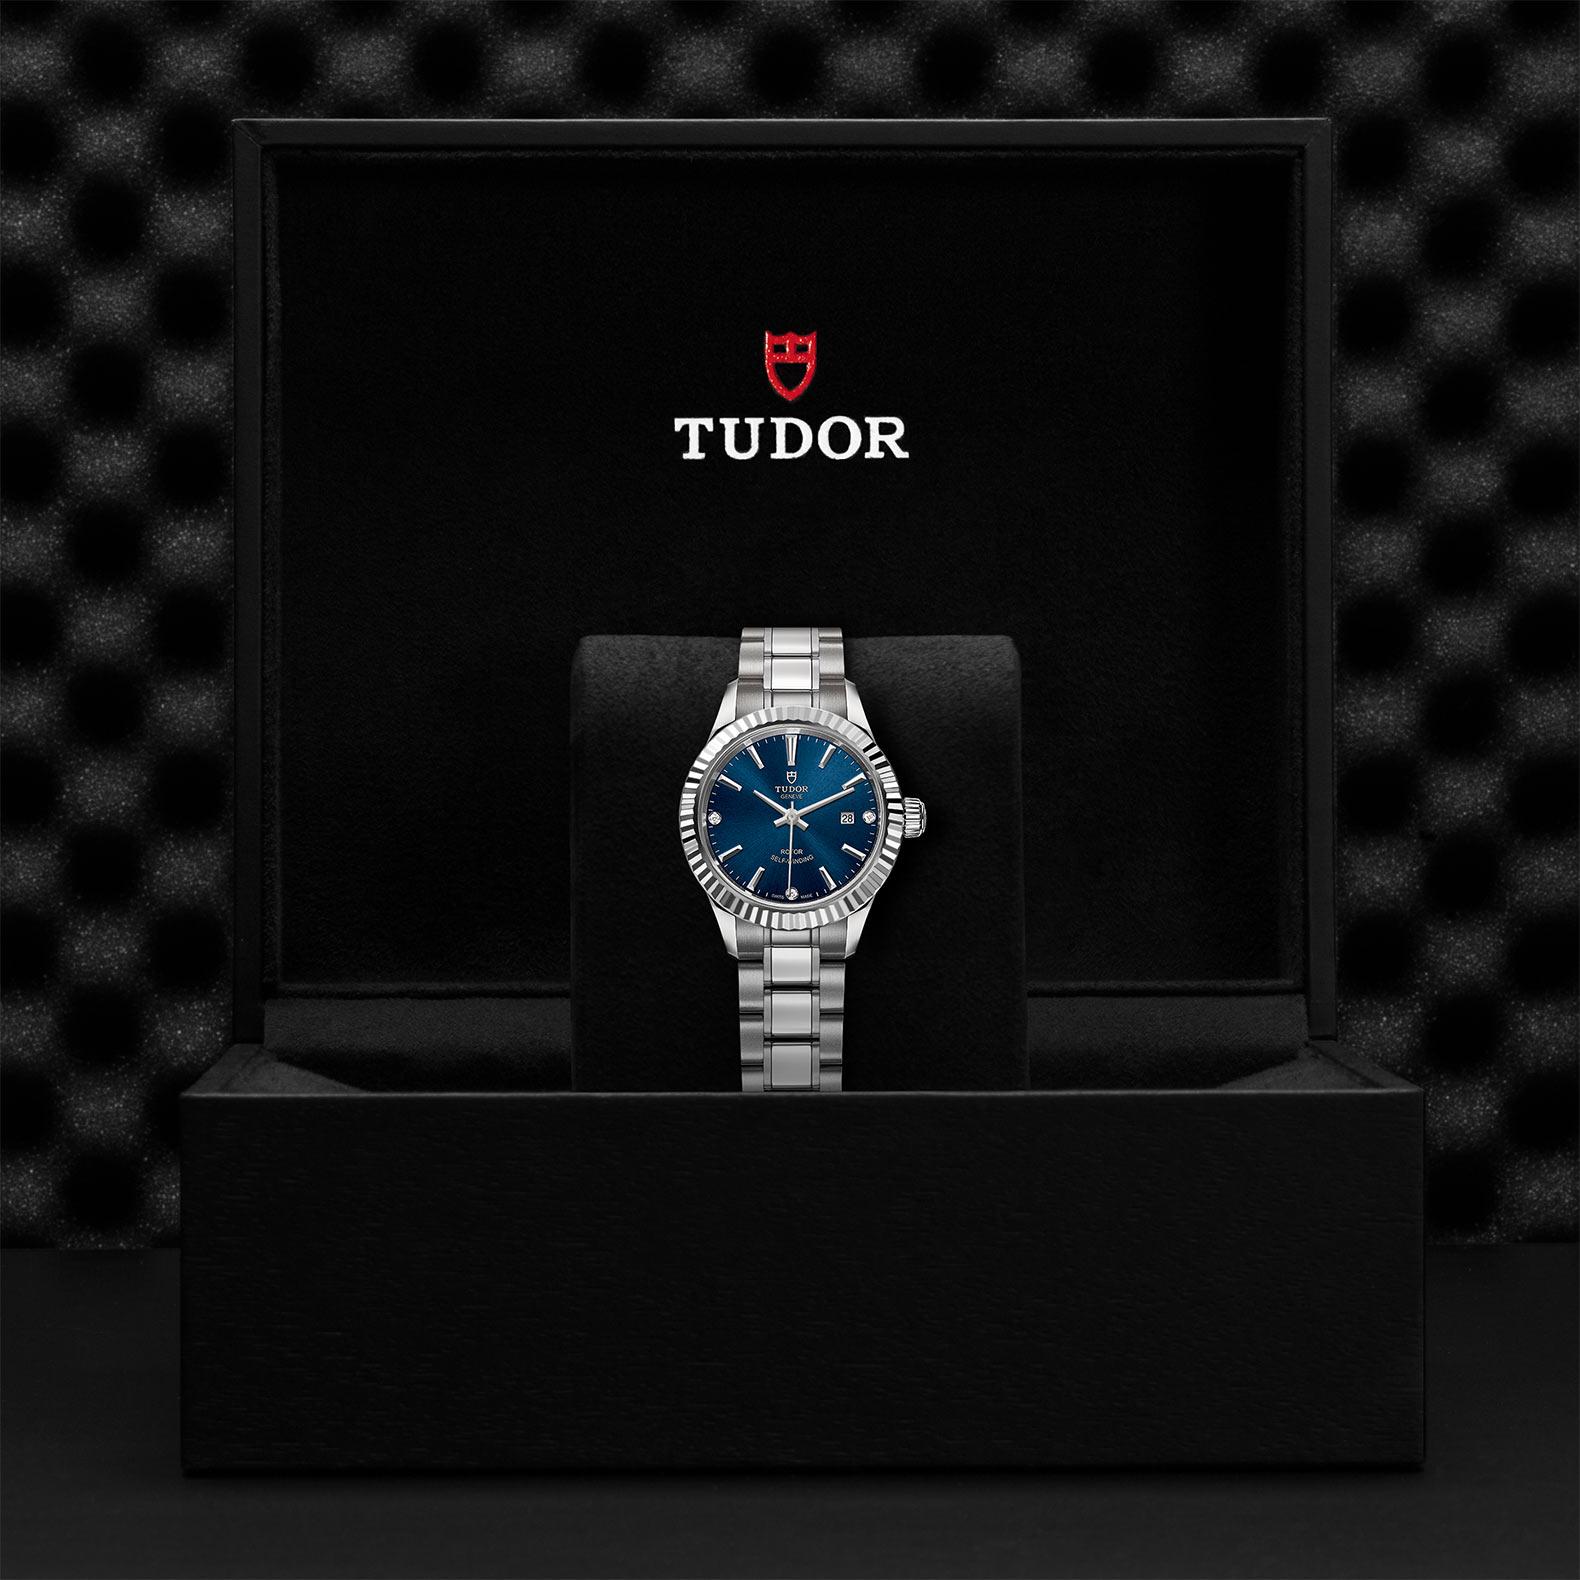 TUDOR Style M12110 0017 Presentation